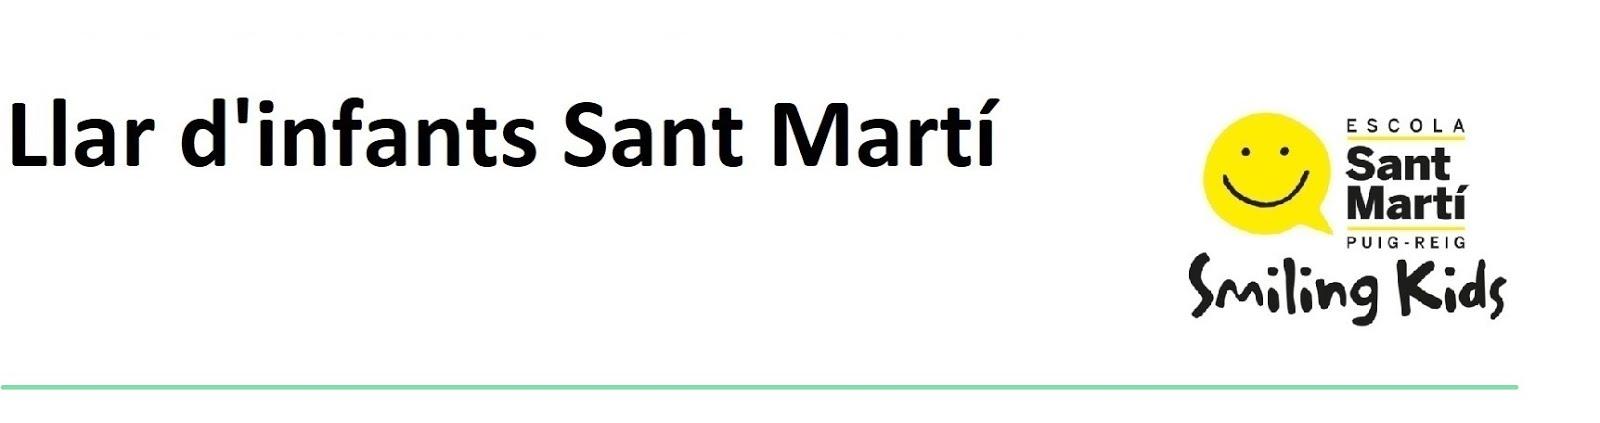 Llar d´infants Escola Sant Martí